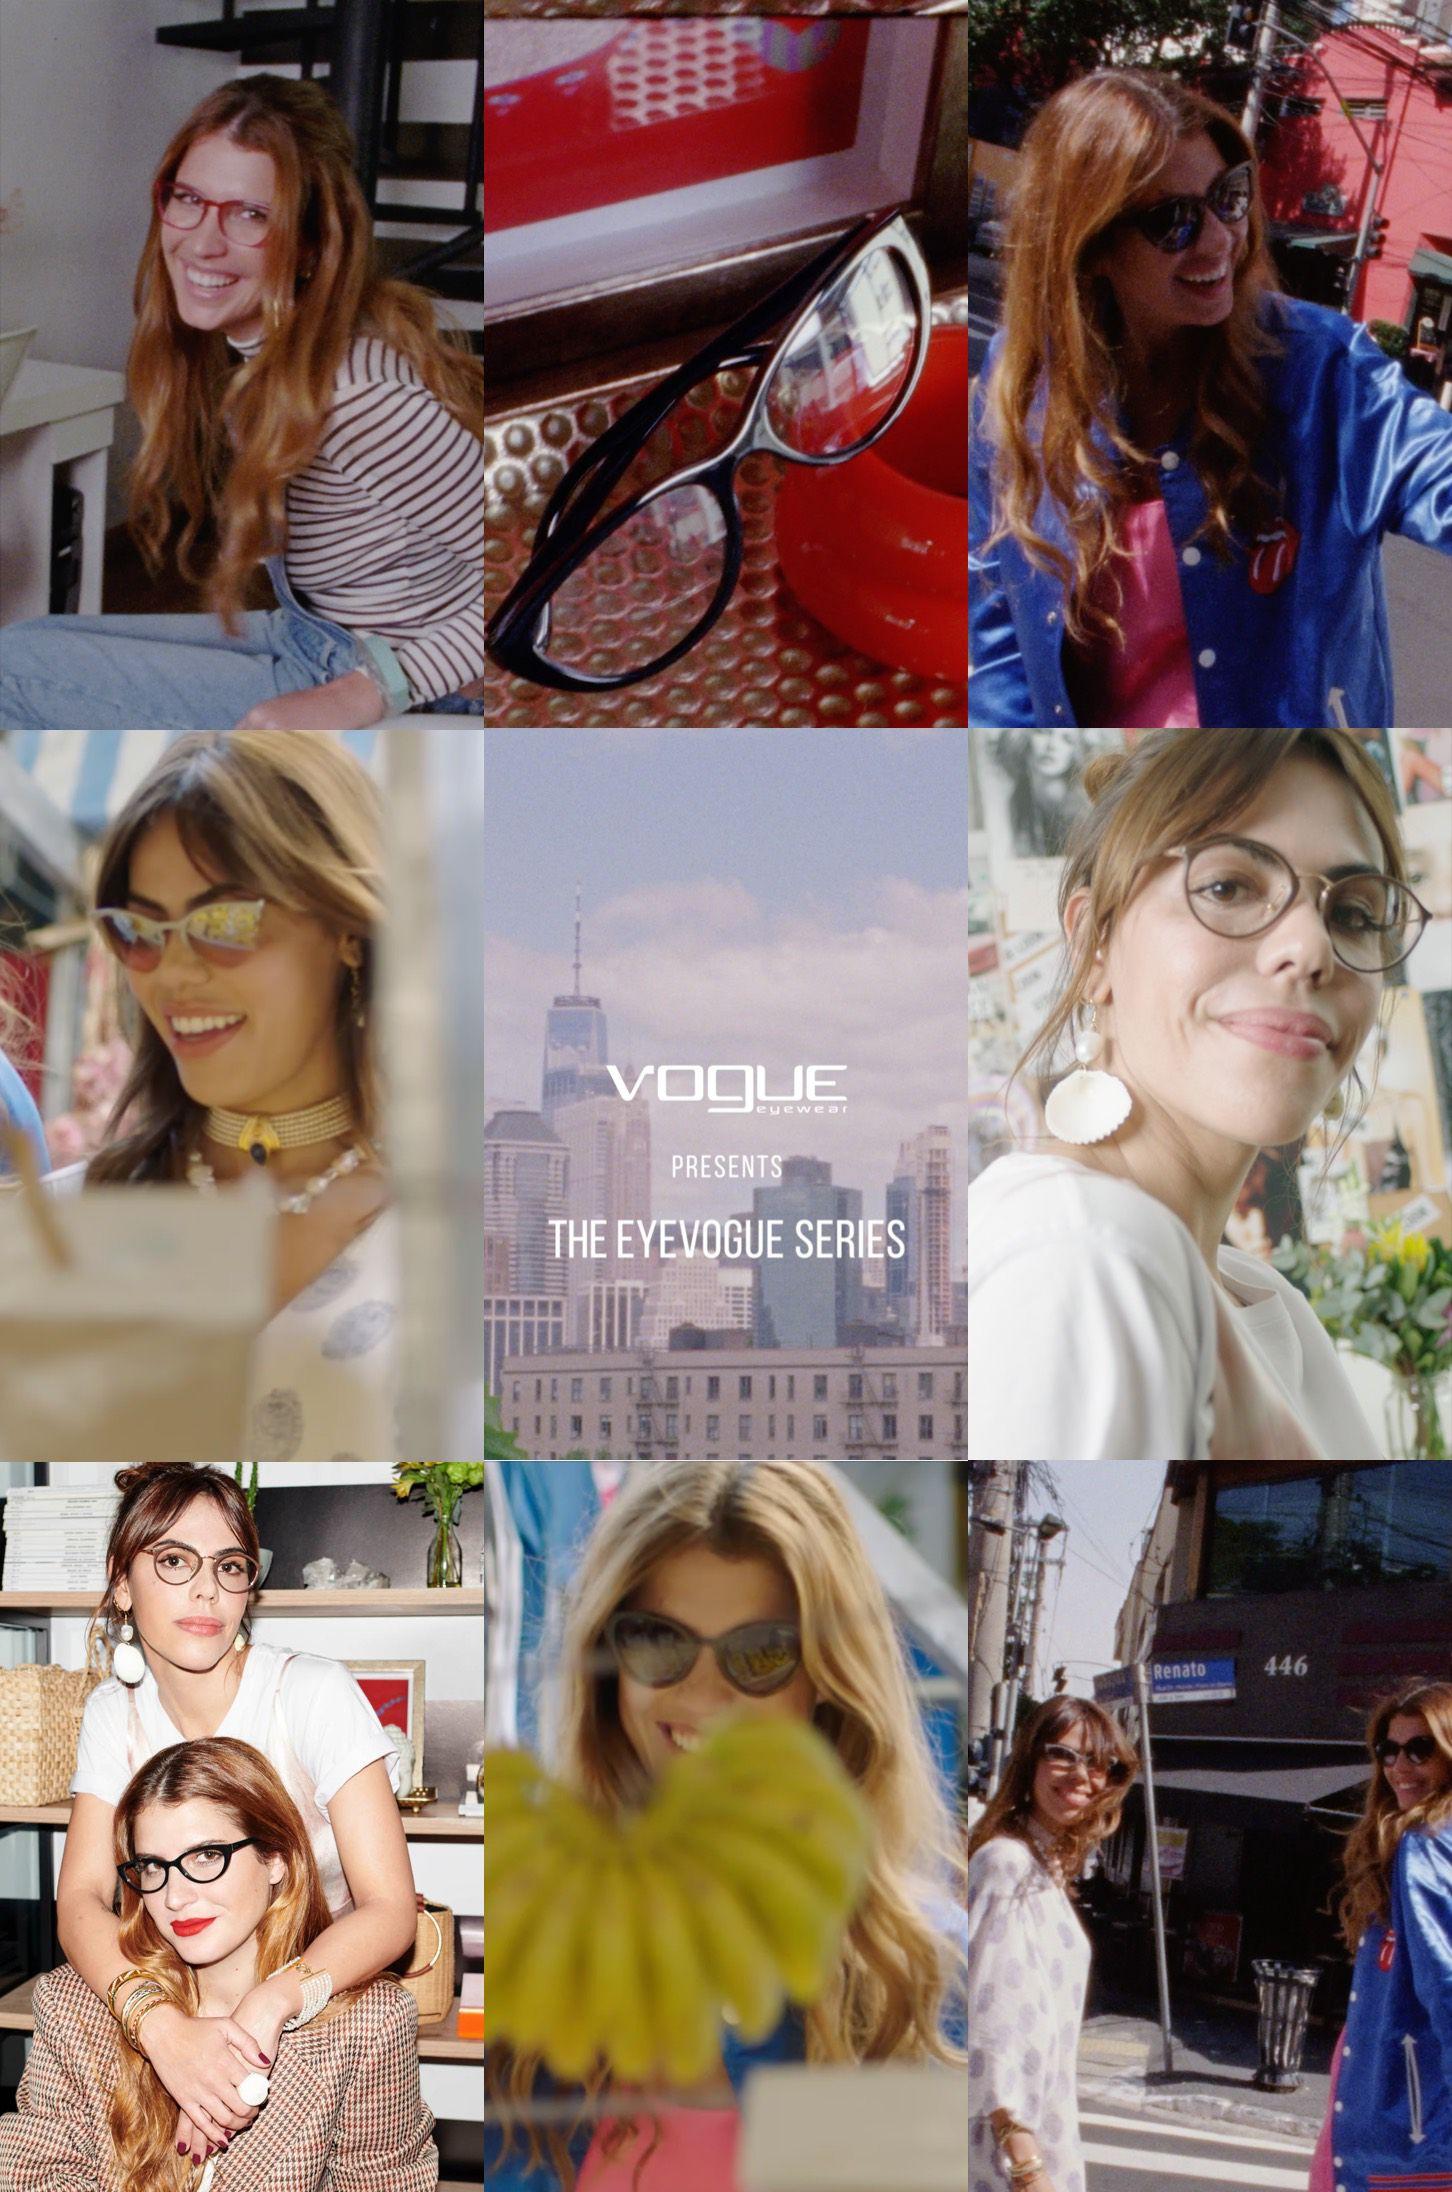 Manuela Catharina overlay left interview image